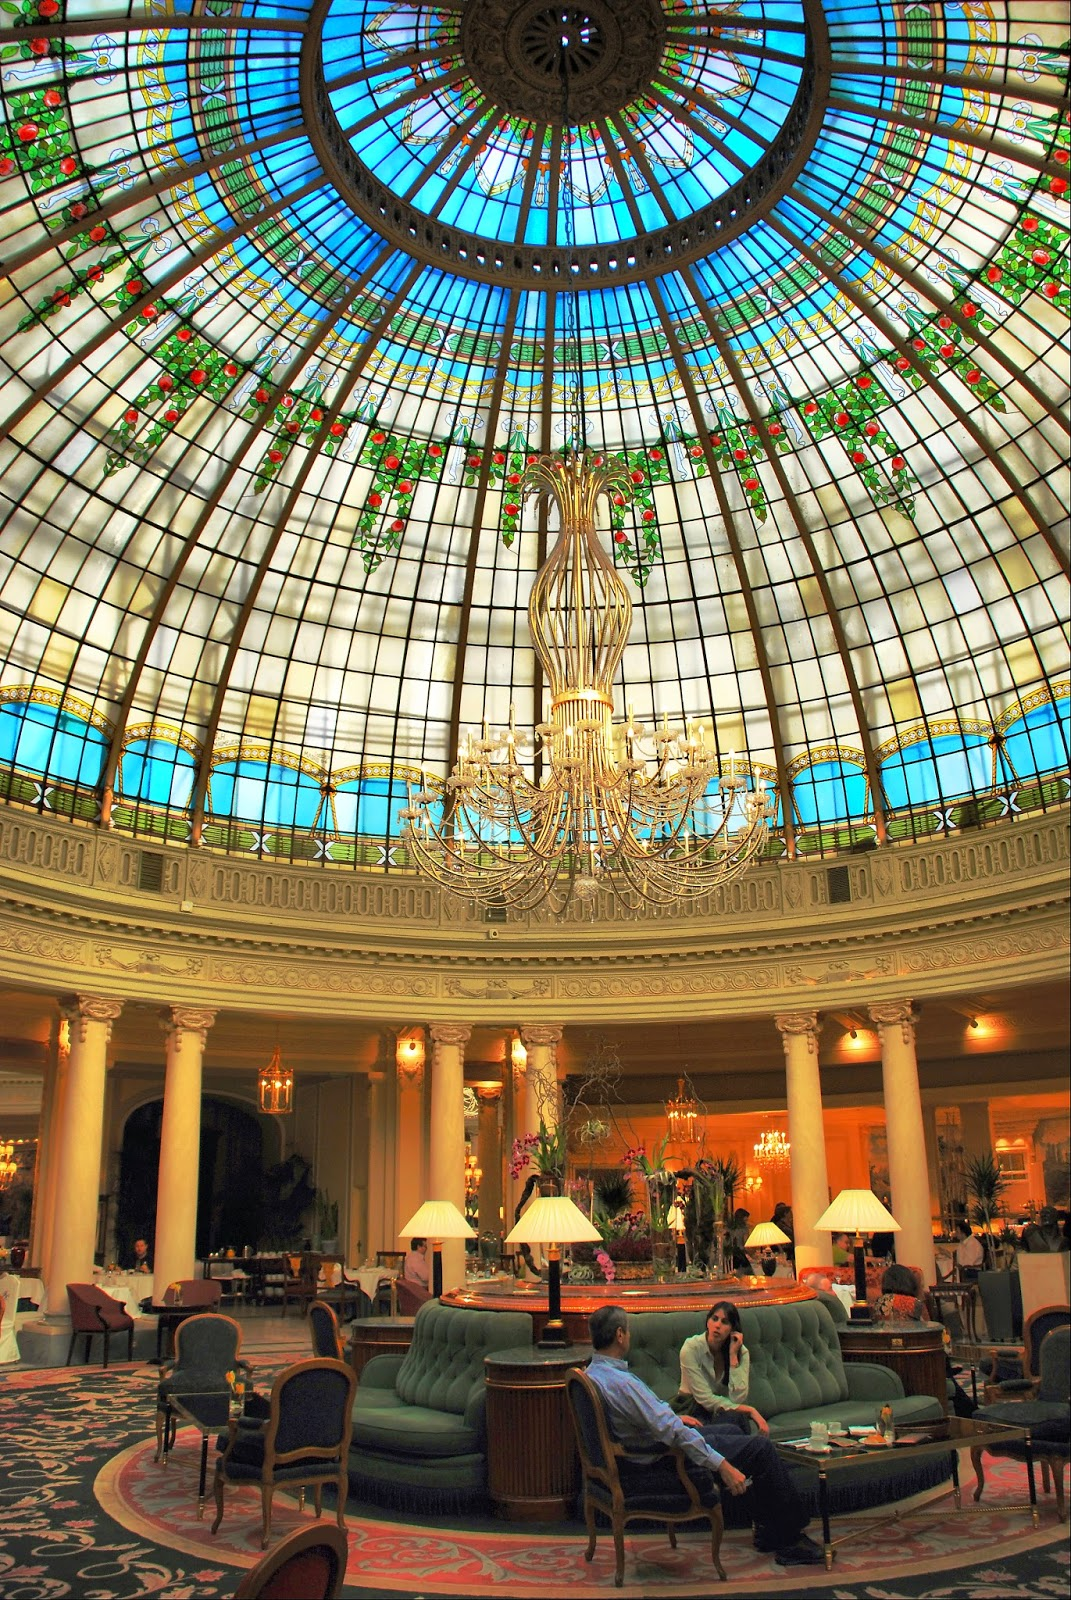 Hotel Palace. Cúpula de la Rotonda.